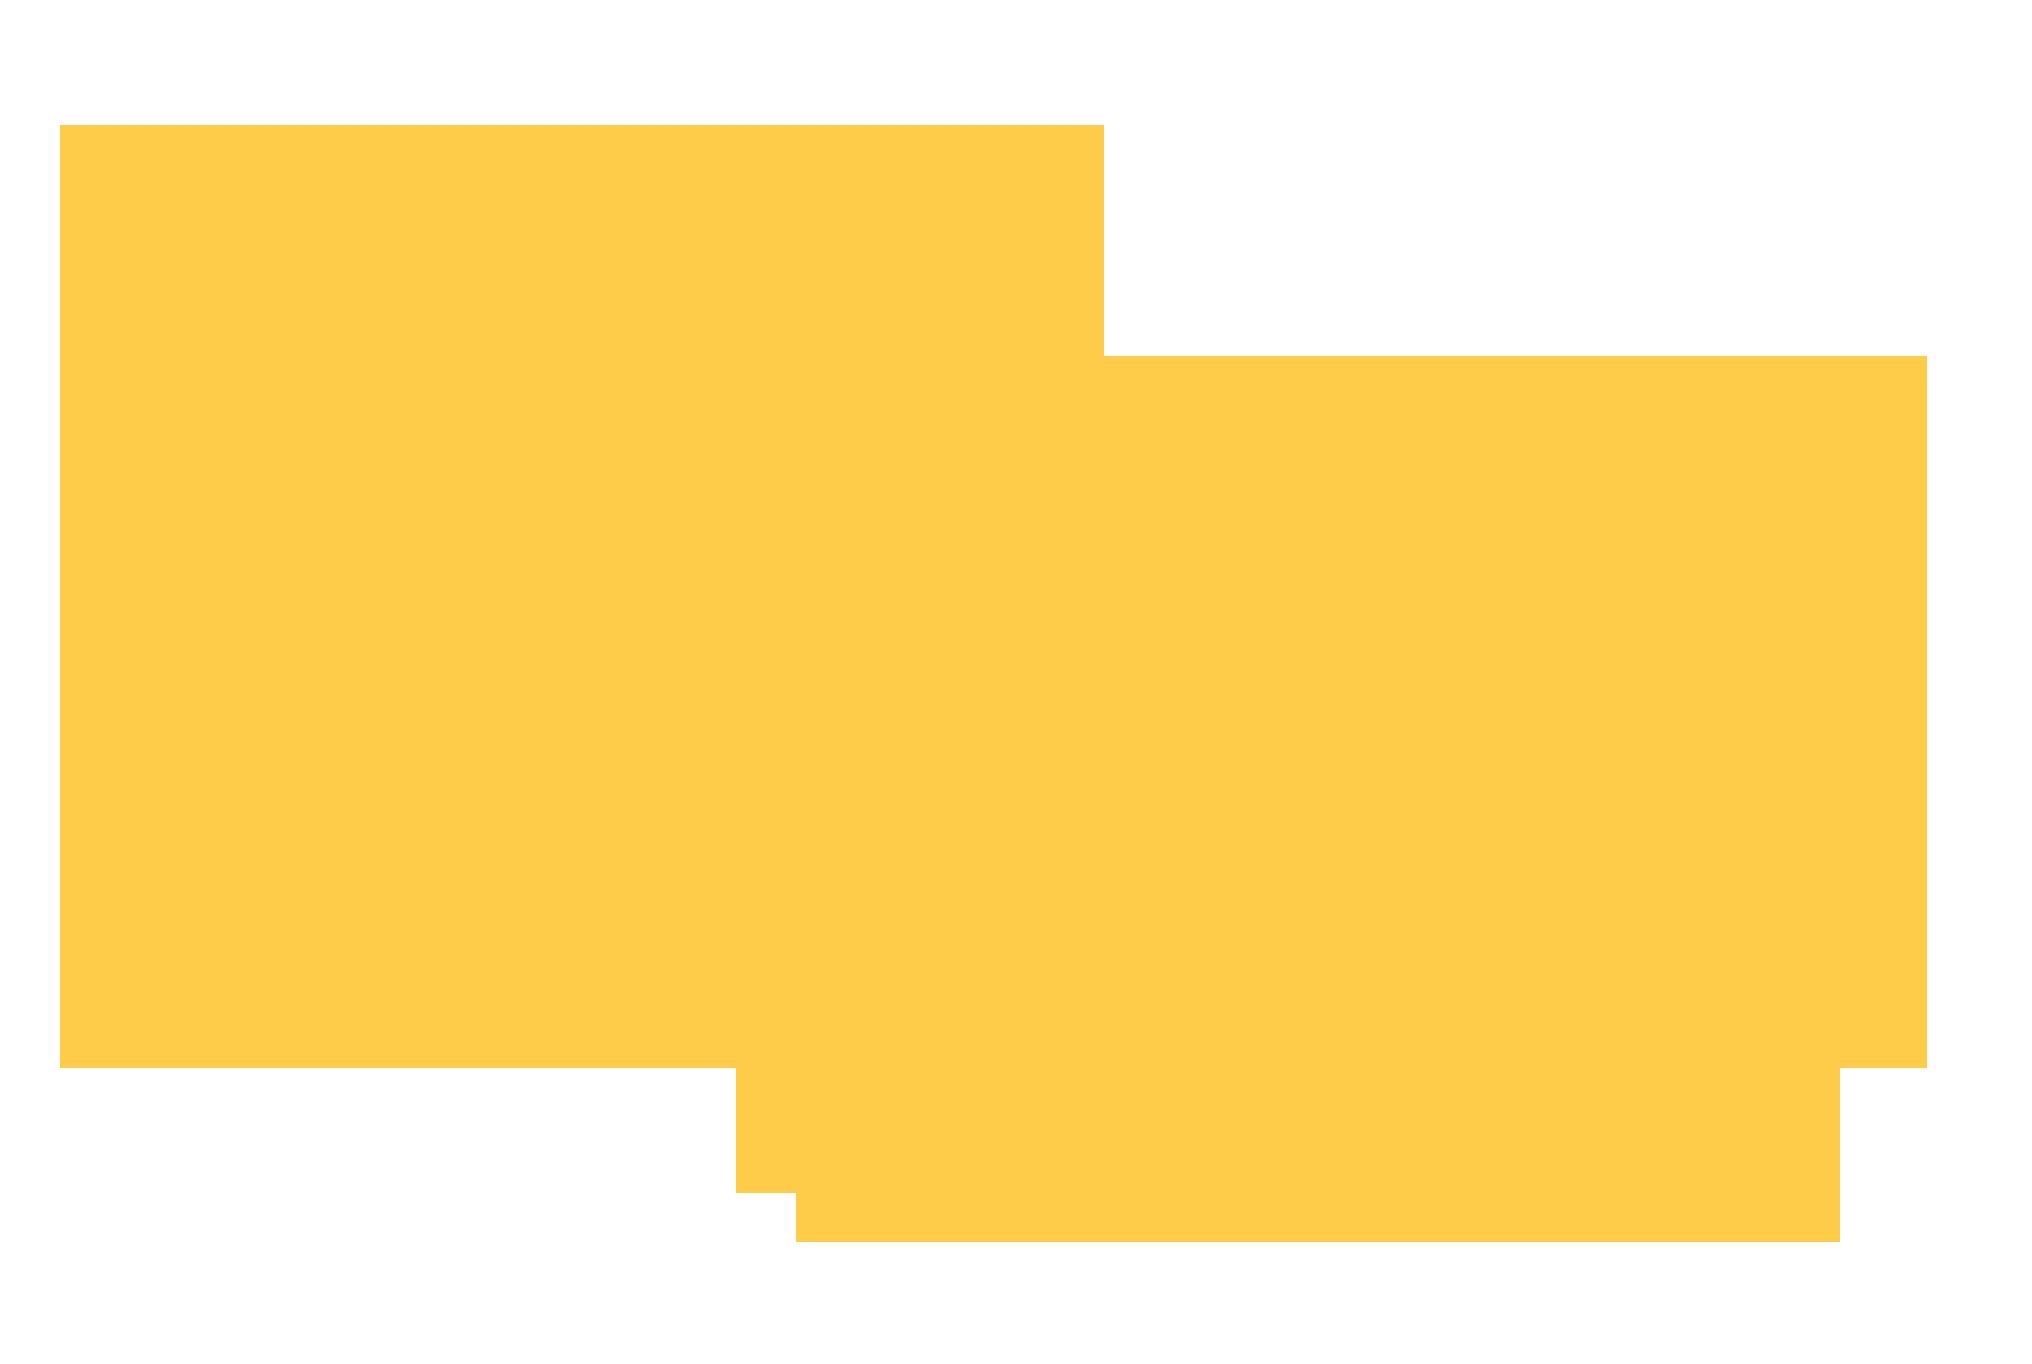 GBG Mimefest